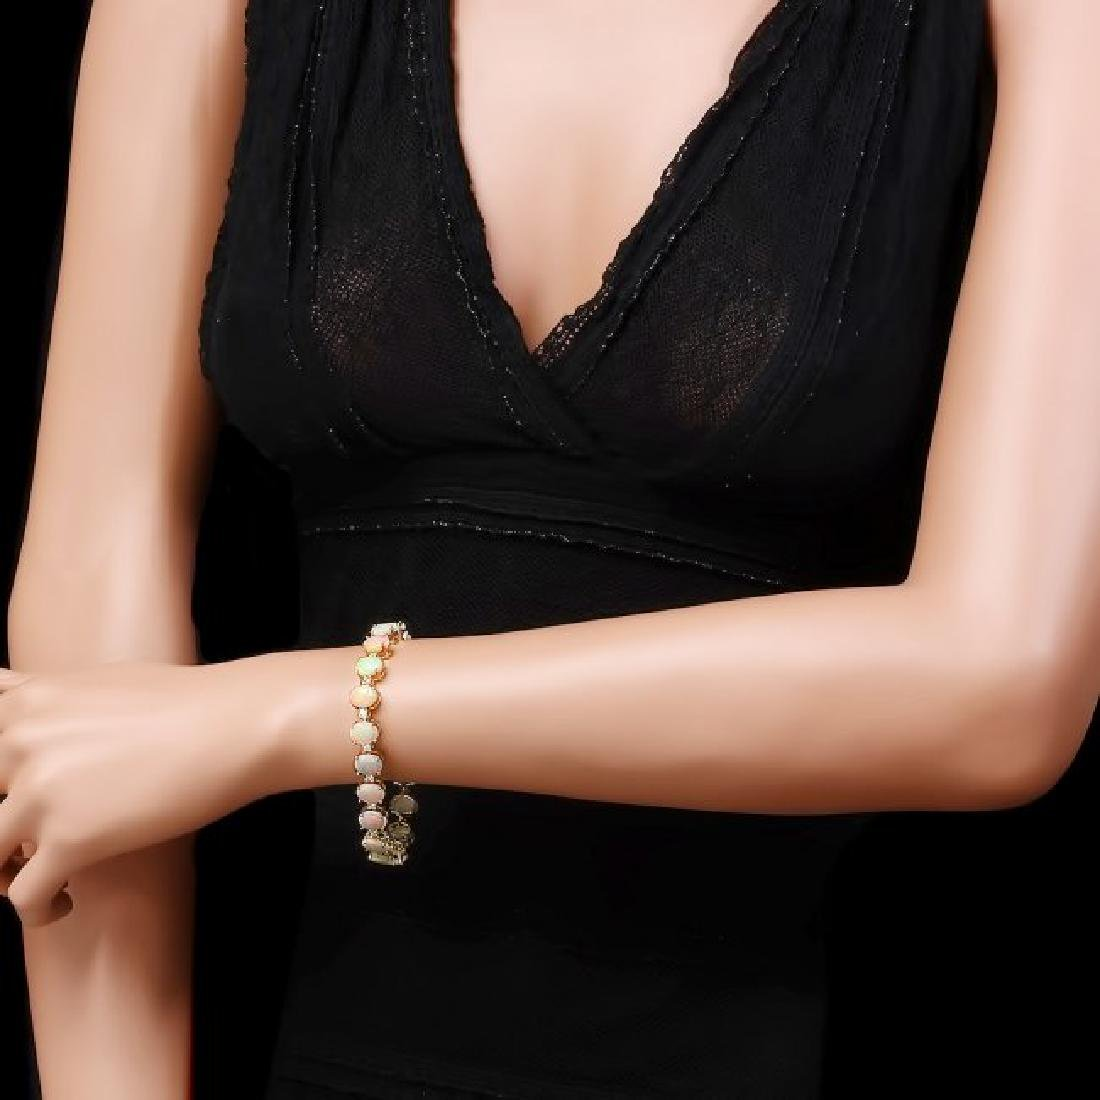 14k Gold 18.00ct Opal 1.50ct Diamond Bracelet - 4